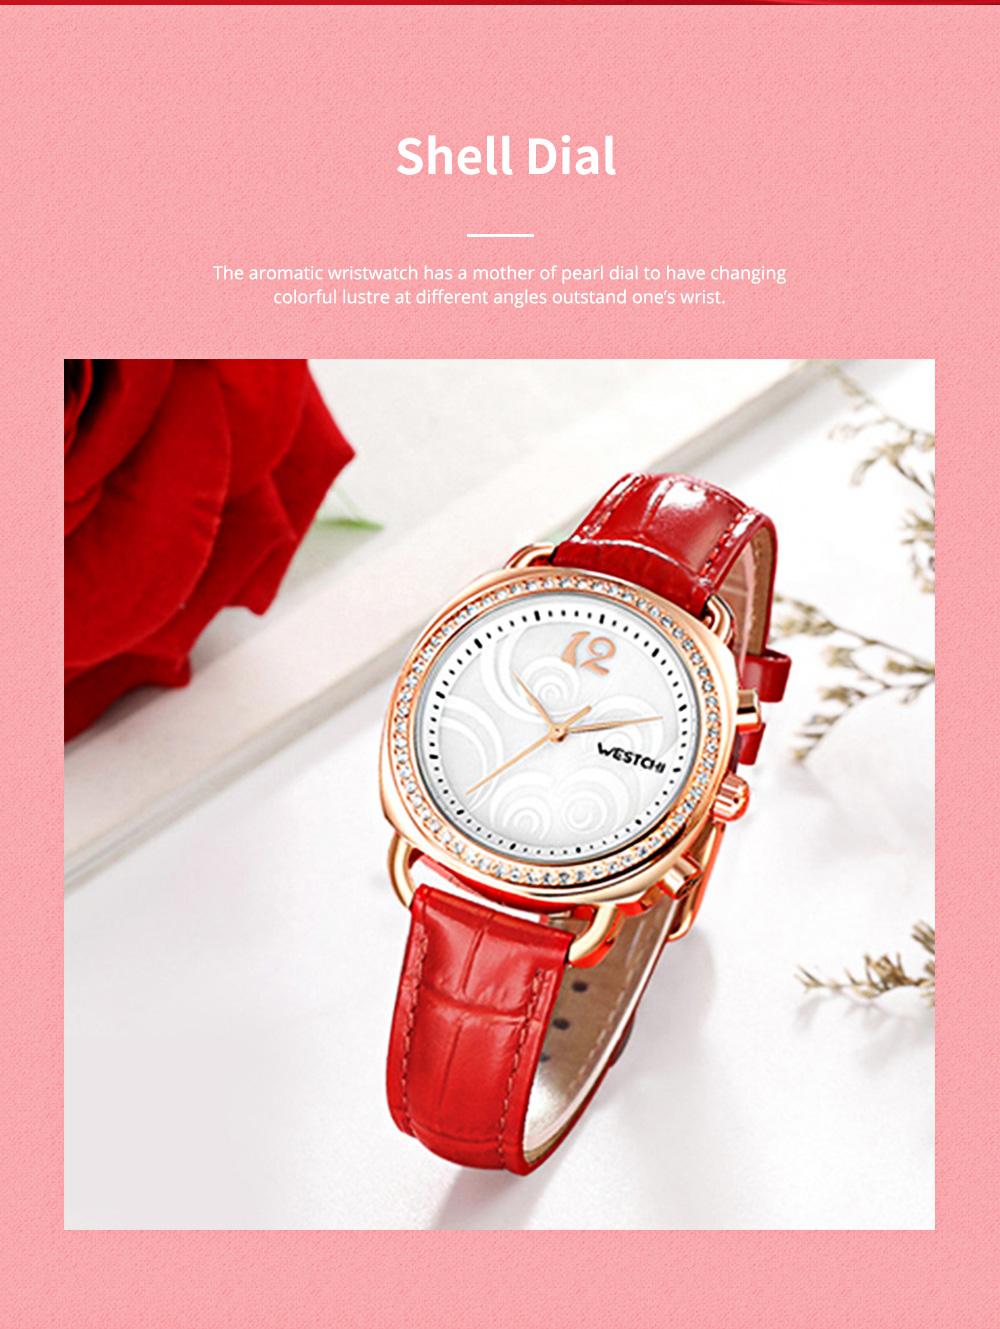 Fashionable Women's Wristwatch with Perfume Smell Screw-in Watch-head Wear Resistant Leather Miyota Quartz Watch 1